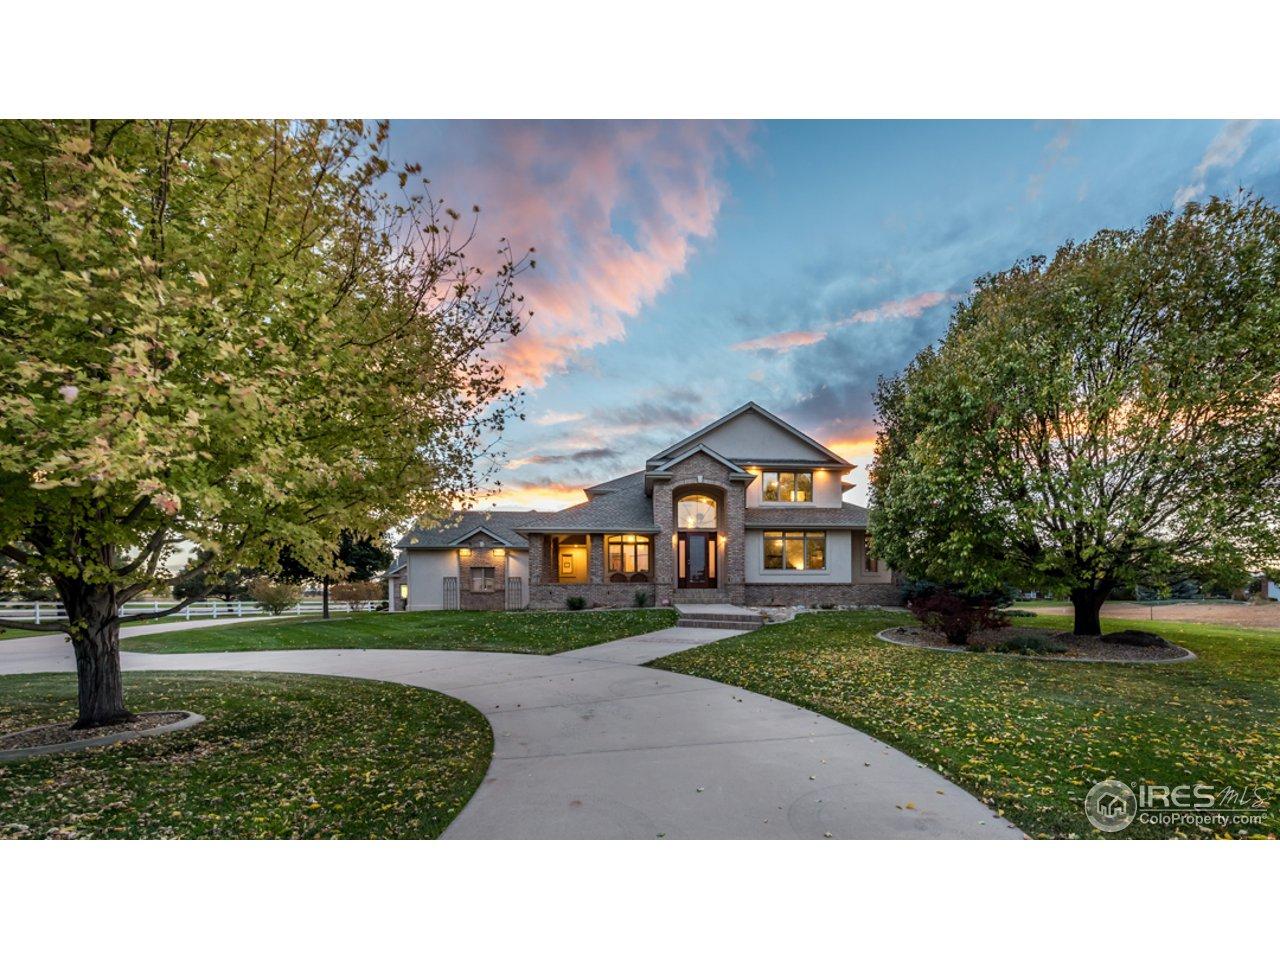 1667 Greenstone Trl, Fort Collins CO 80525